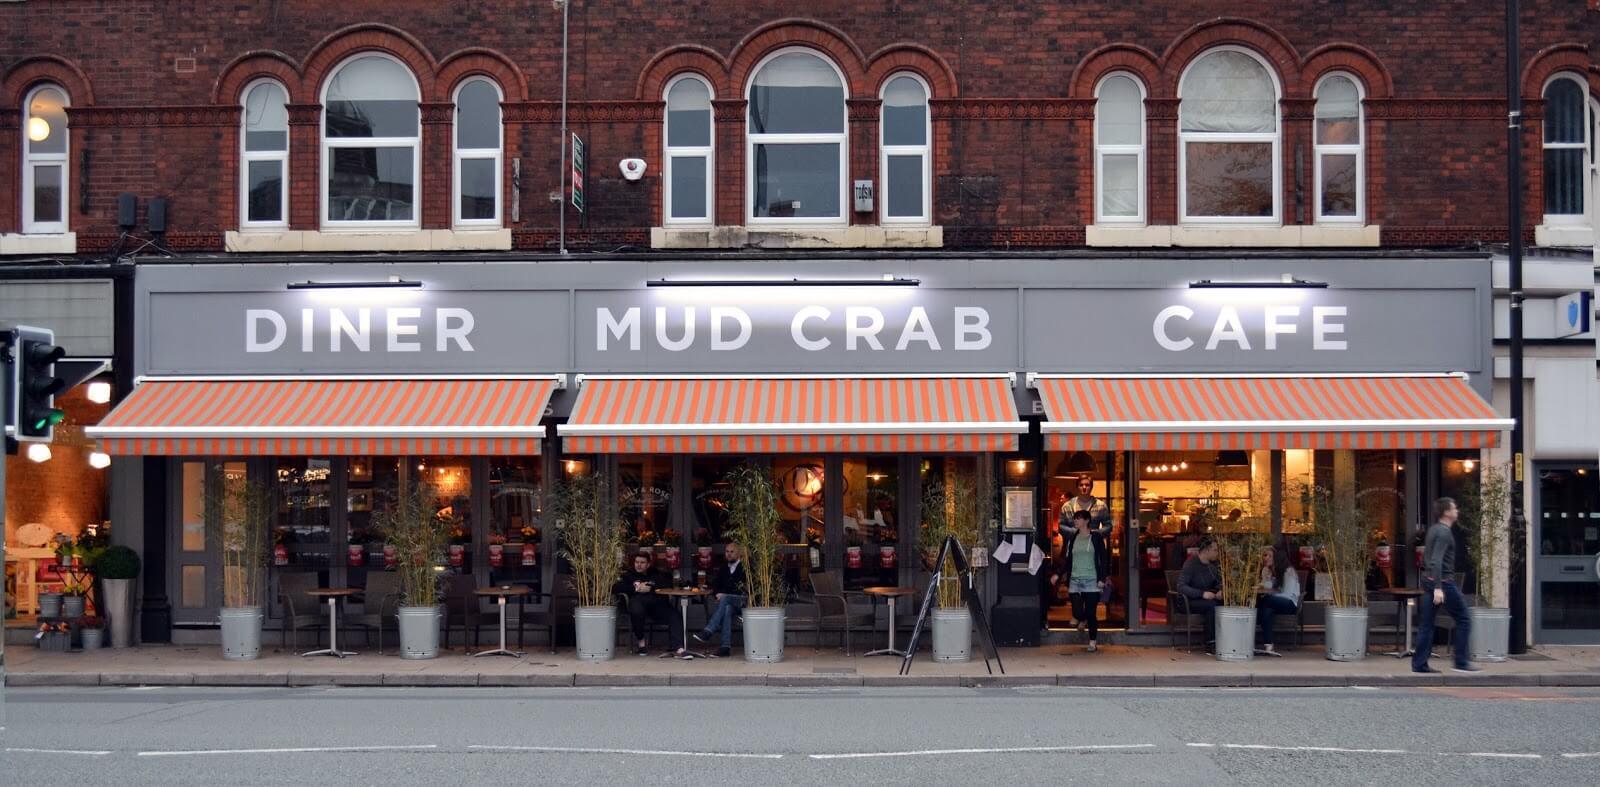 JR-A101-Puma-Mud-Crab-Diner-Didsbury-2